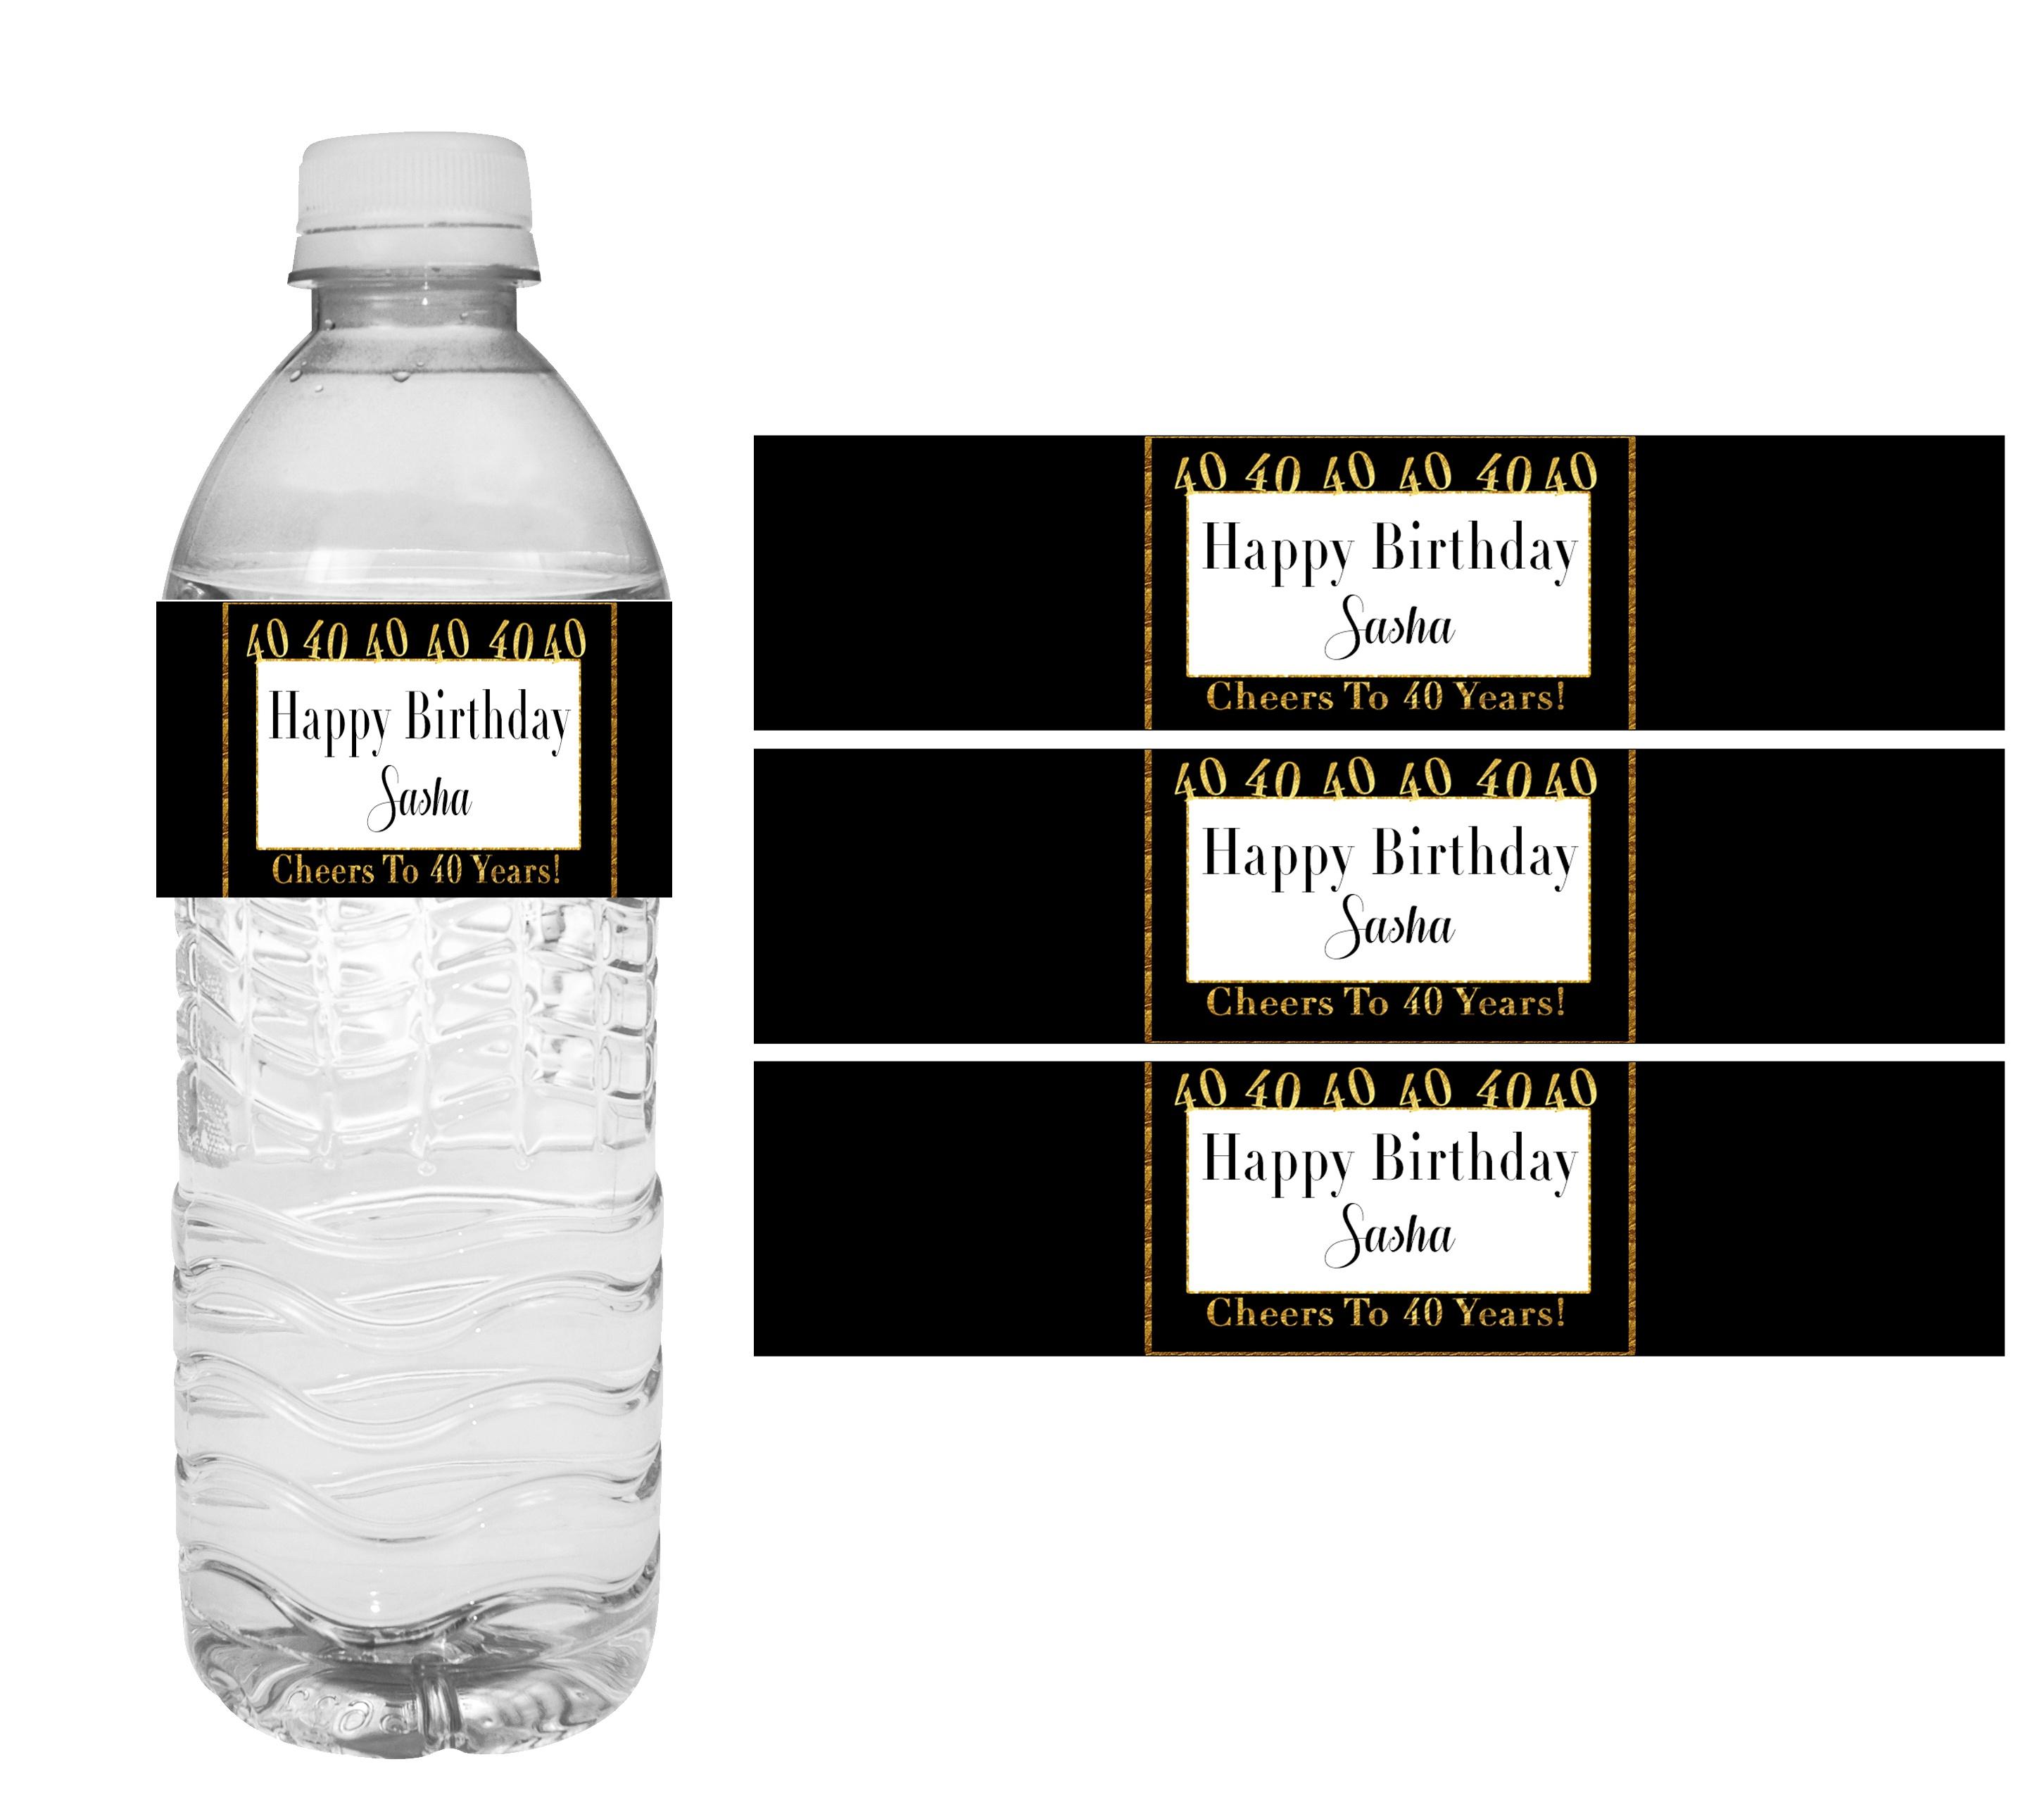 40Th Birthday Party Decorations- Diy Printable Water Bottle Labels - Free Printable Water Bottle Labels For Birthday